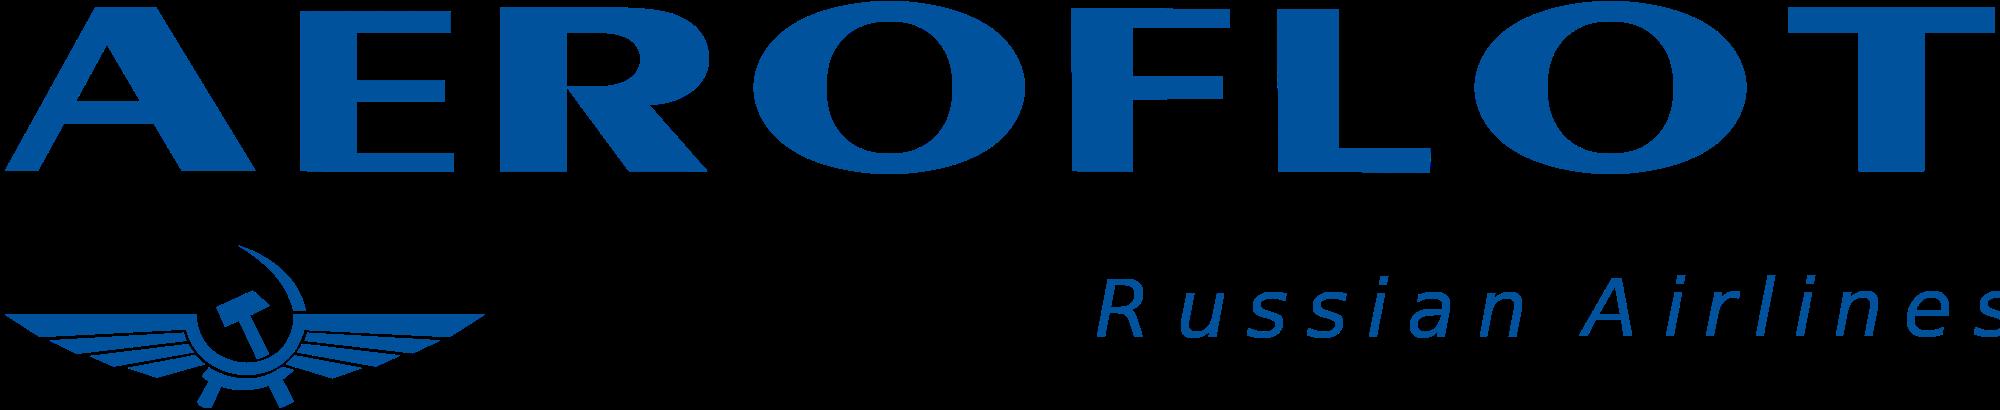 Open PlusPng.com  - Aeroflot Russian Airlines Vector PNG